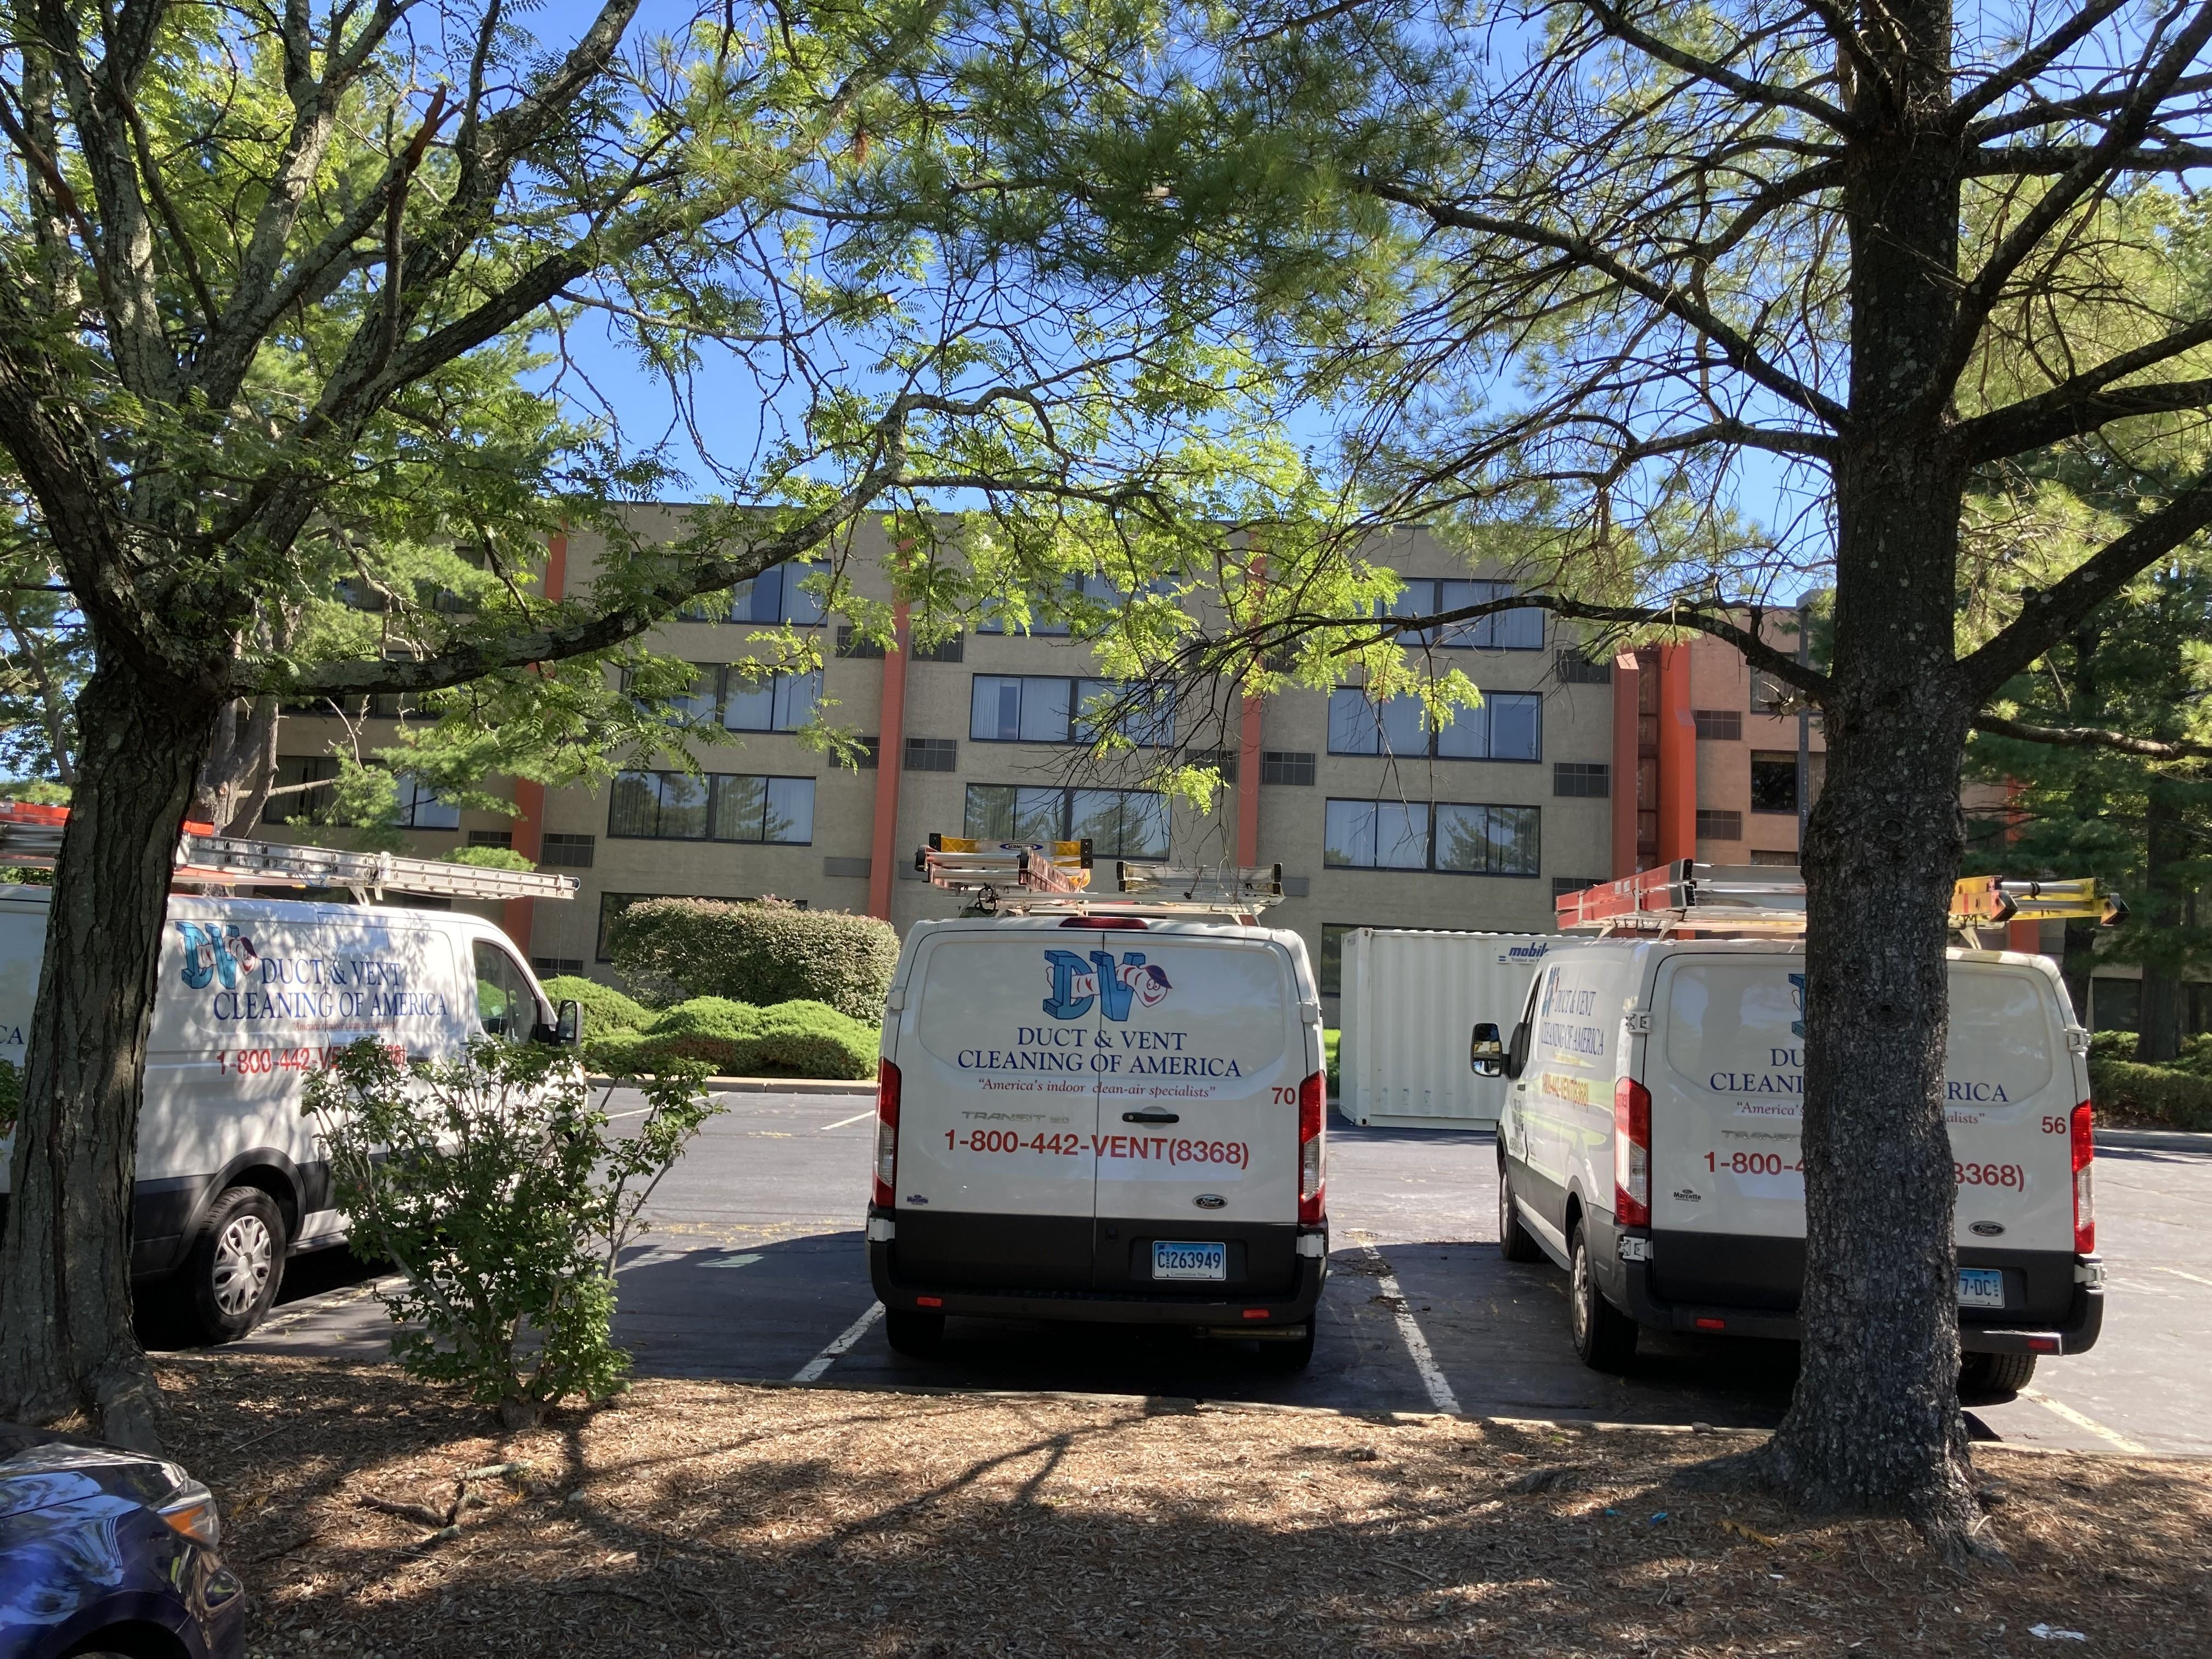 Hilton Hotel – Woodcliff Lake, NJ Hilton-Hotel-Woodcliff-Lake-NJ.jpg